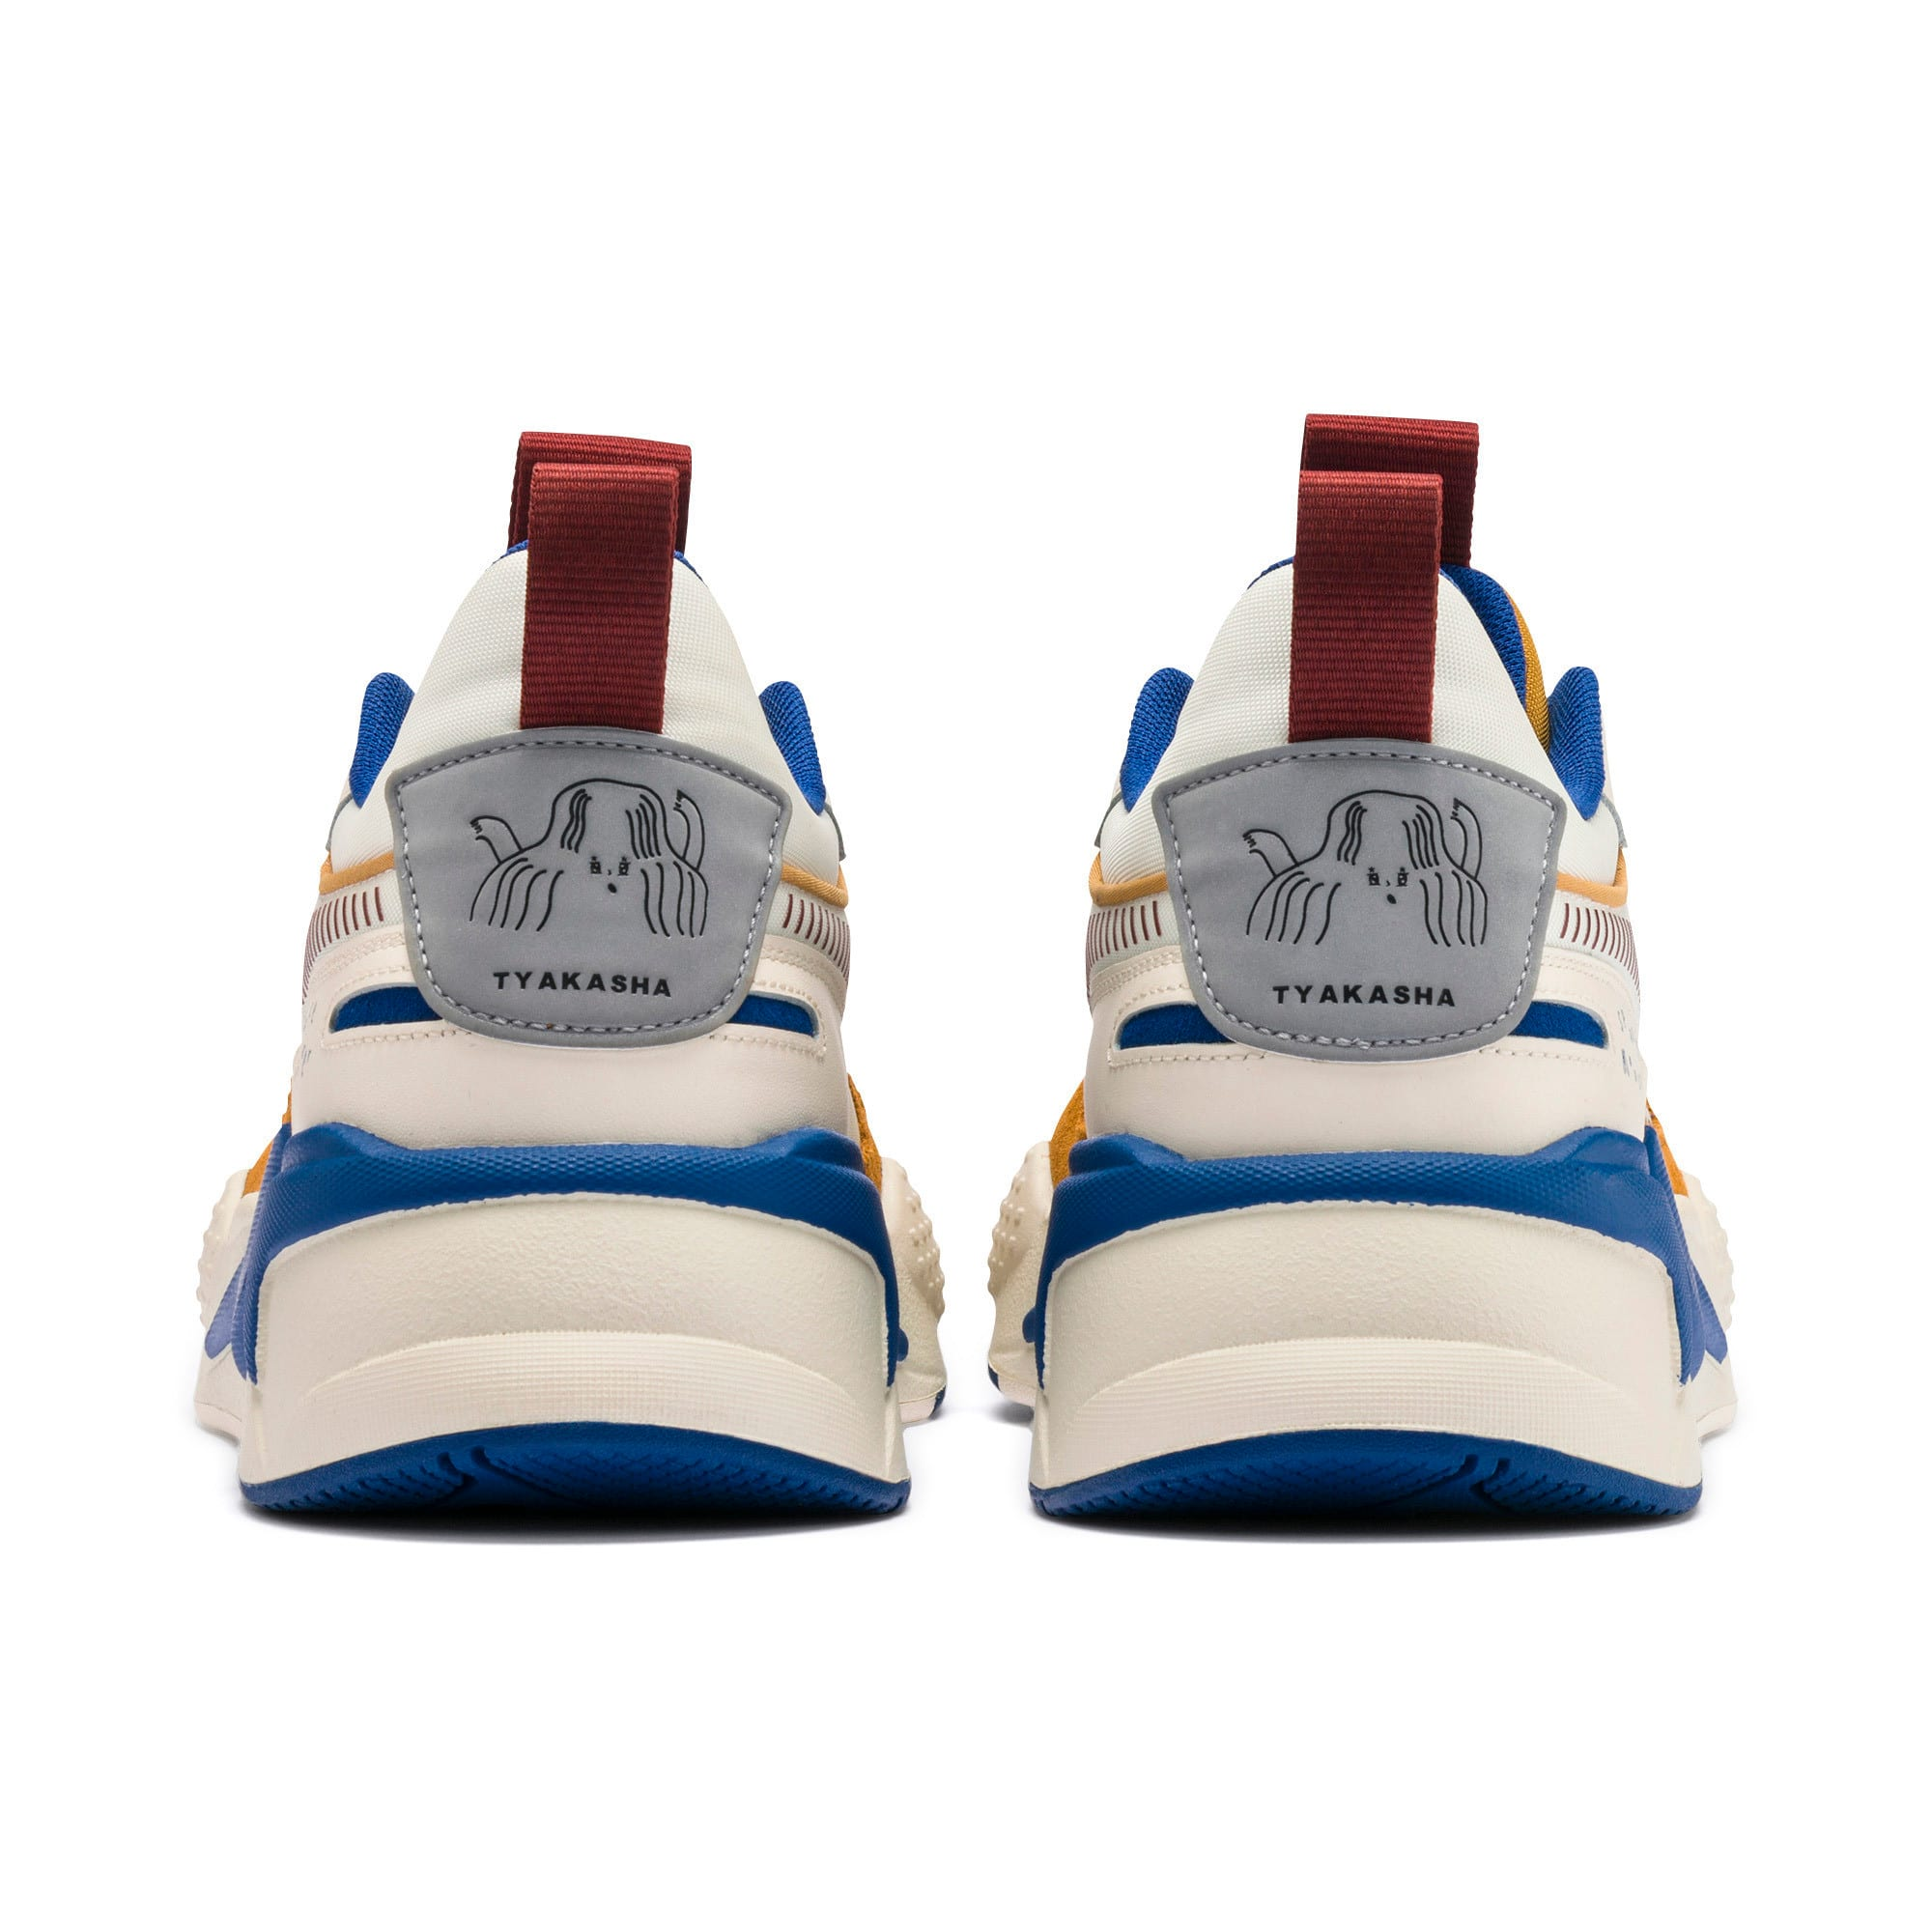 Miniatura 5 de Zapatos deportivos PUMA x TYAKASHA RS-X, Whisper White-Fired Brick, mediano